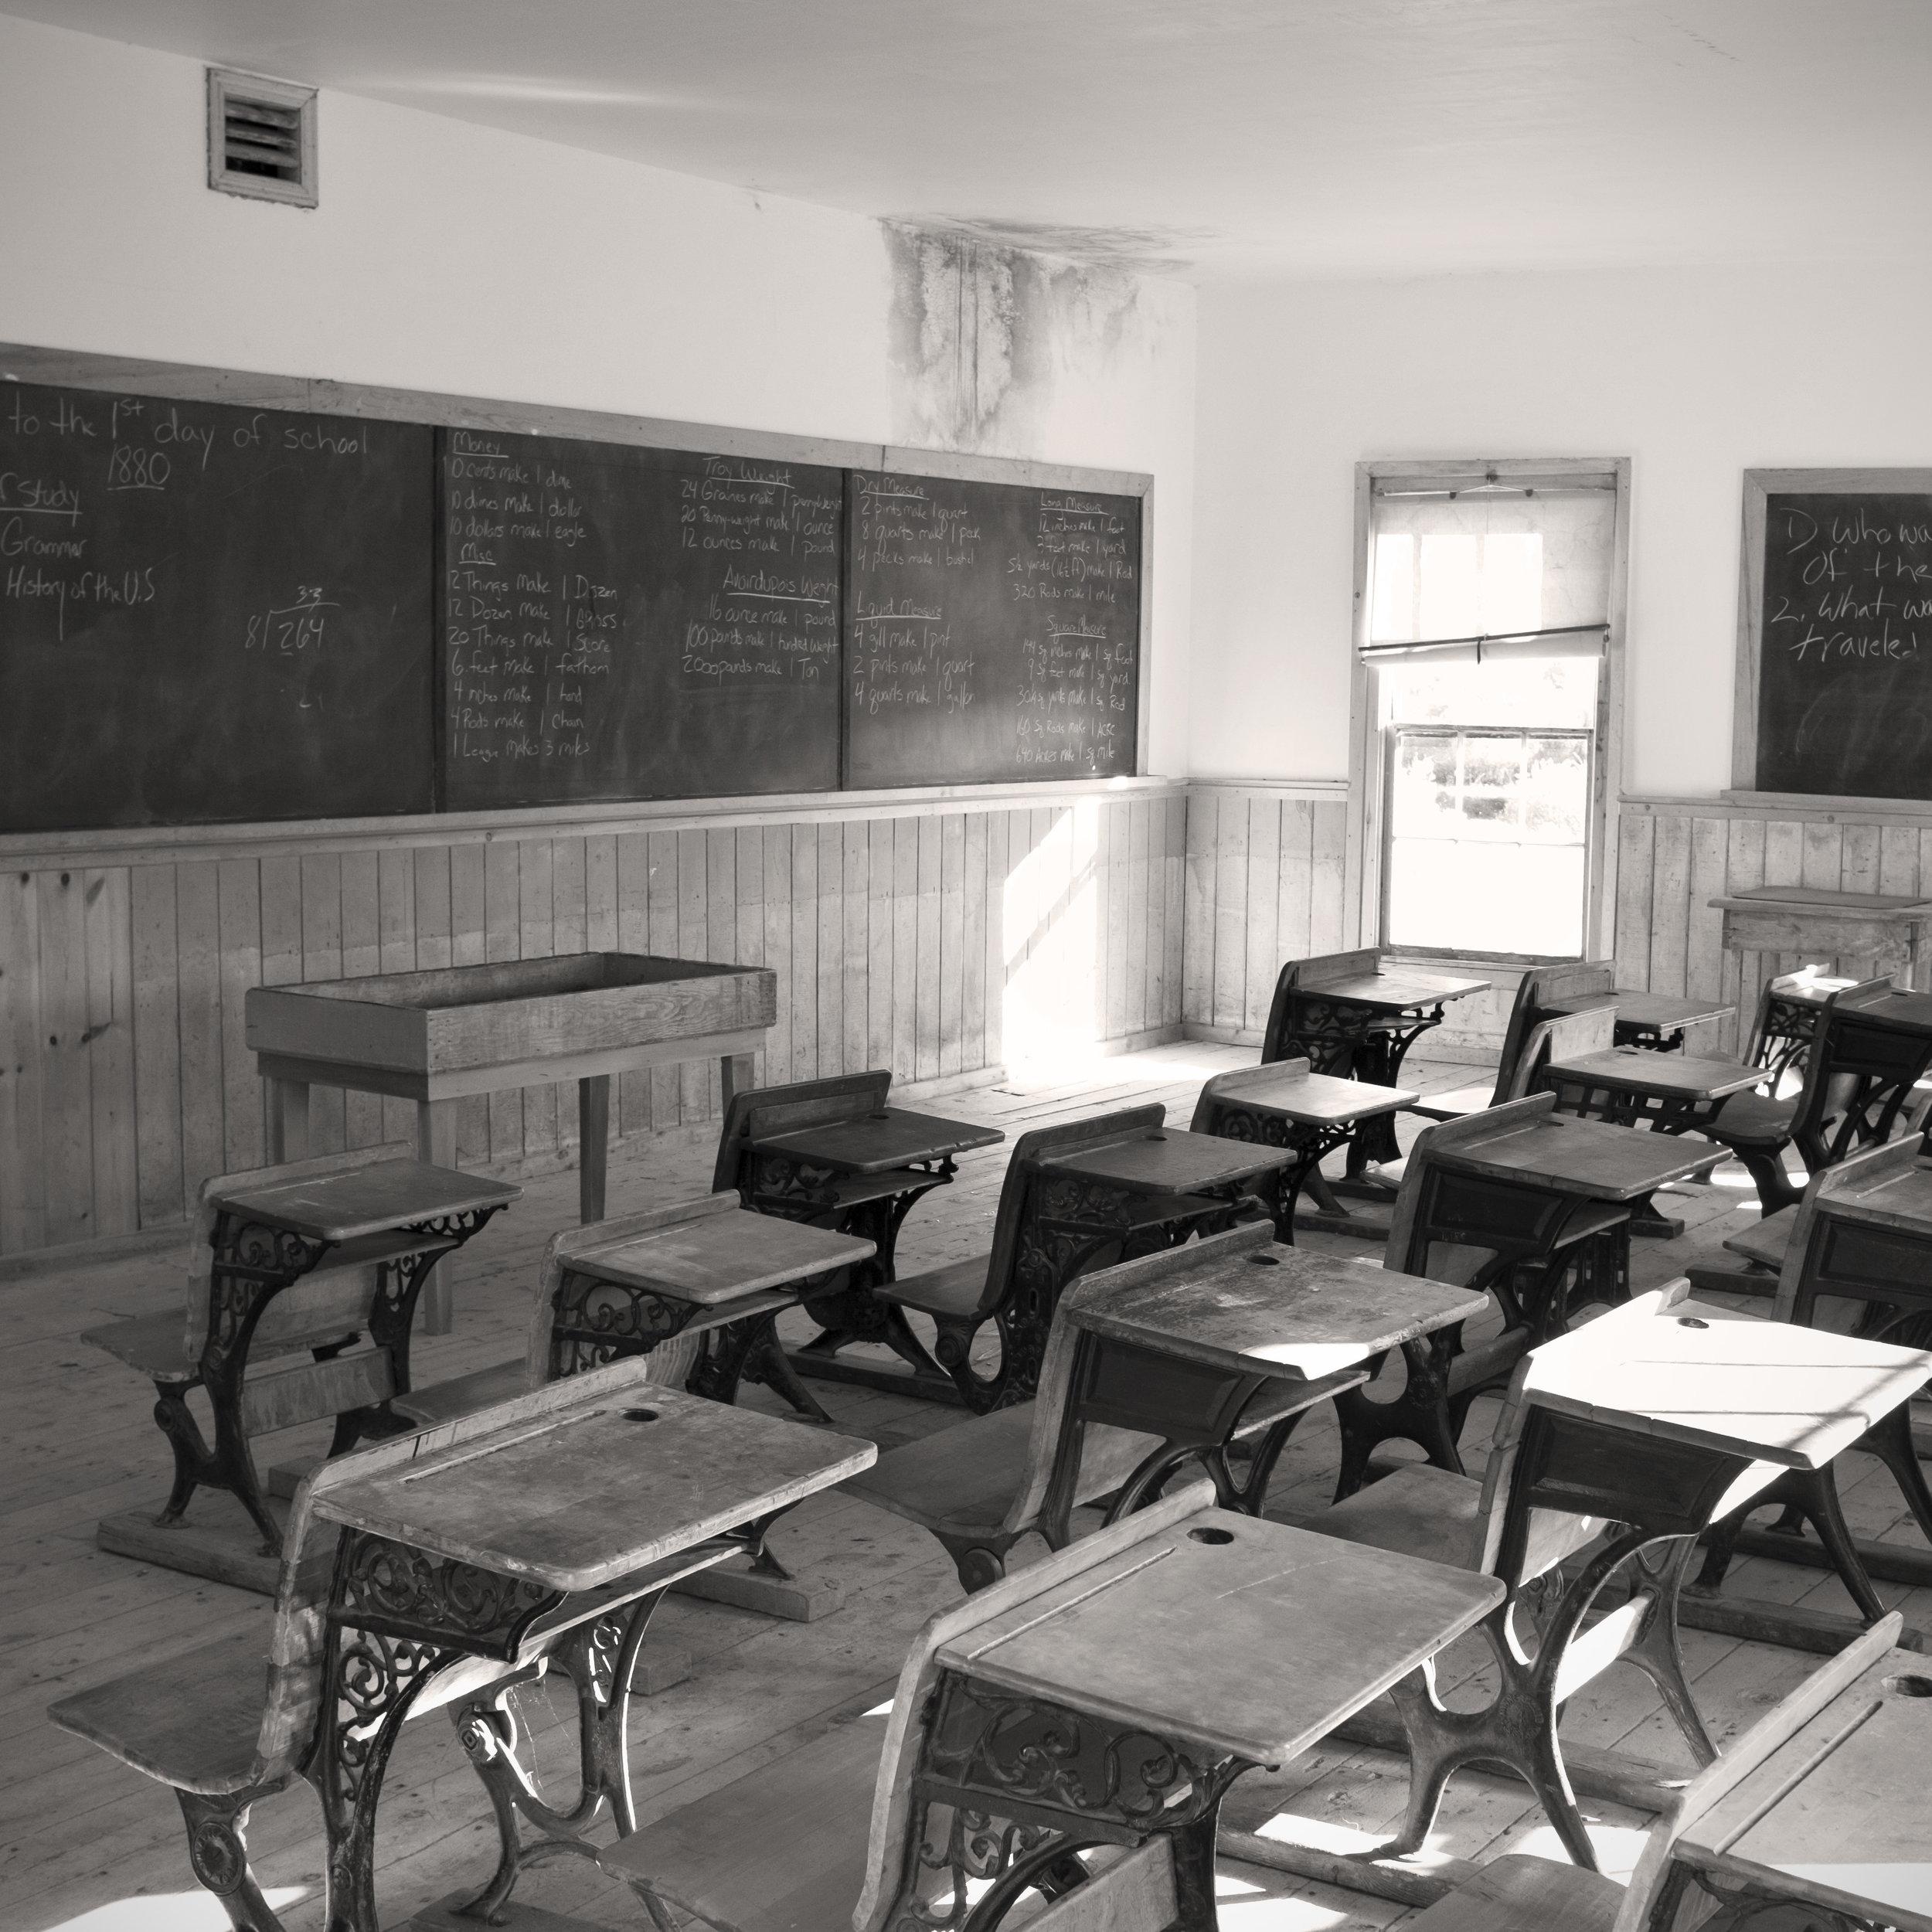 Bannack_School_room.jpg